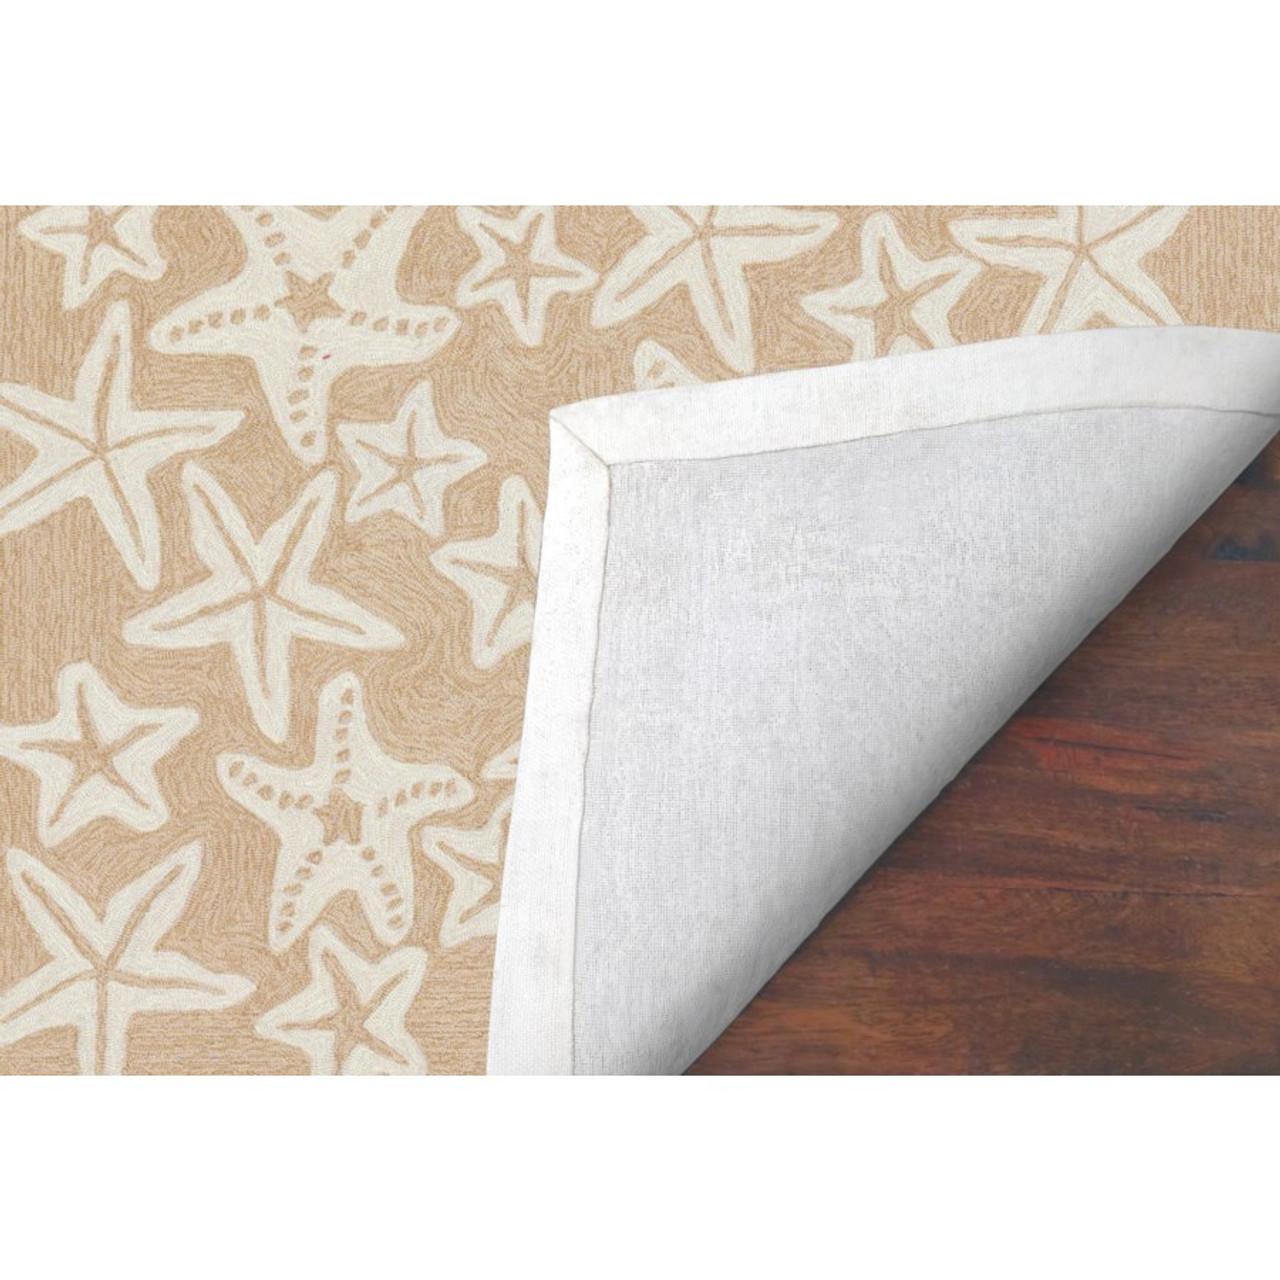 Neutral Capri Starfish Indoor/Outdoor Rug -  Skid Resistant Bottom